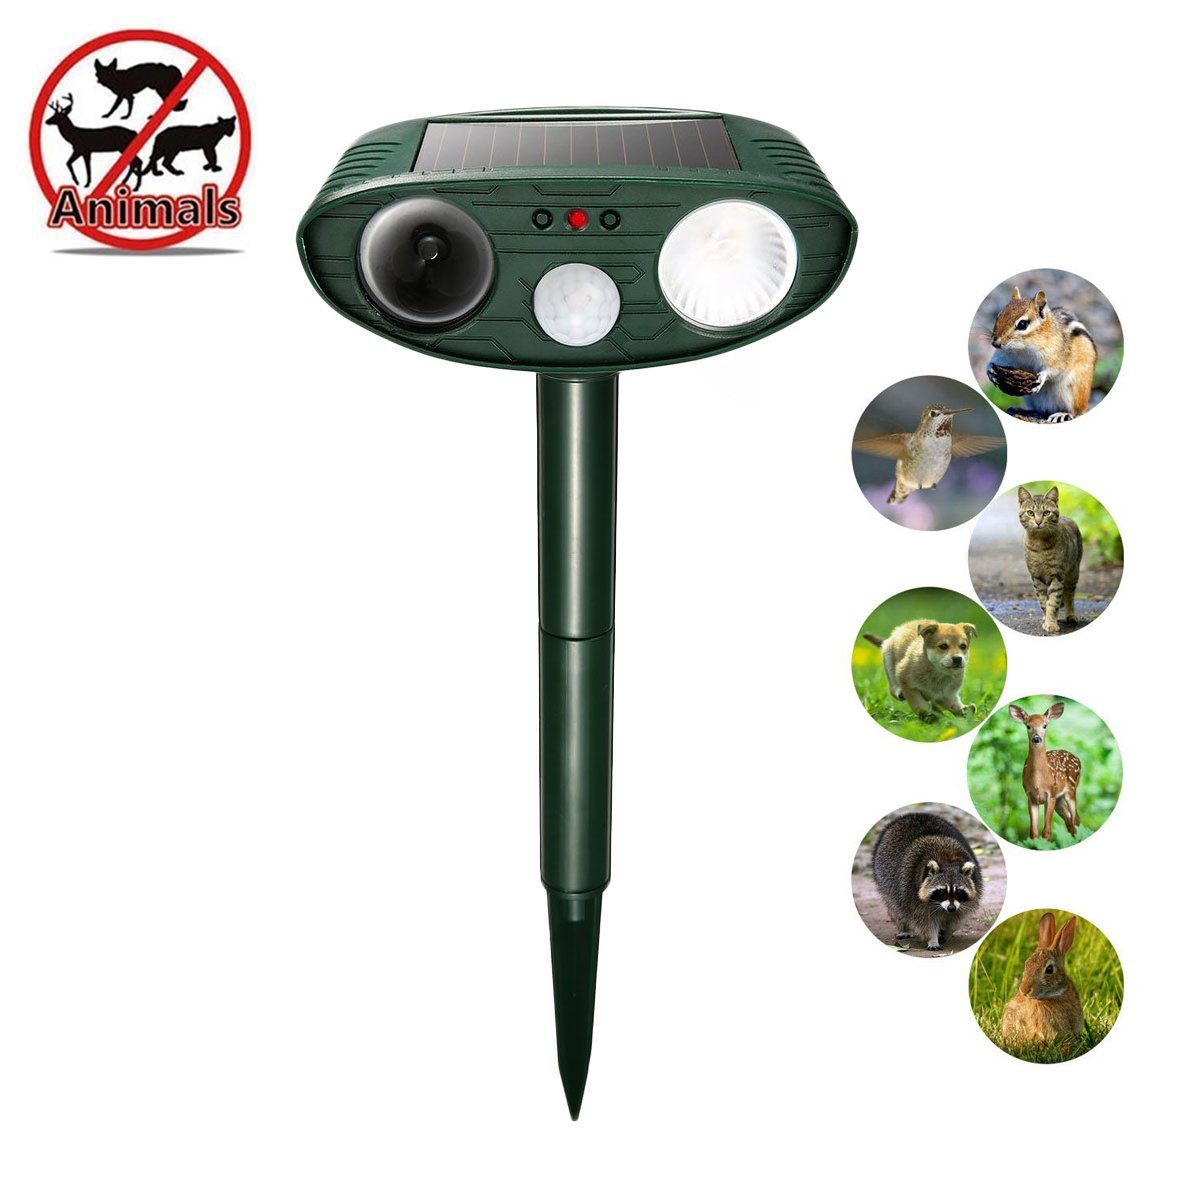 YmissL Ultrasonic Animal Repellent,2018 Upgraded Outdoor Solar Motion Sensor Repeller White Flashing Lights, Dog Repeller, Cat Repellent,Foxes Repeller,Rodent Repellent (Green04)